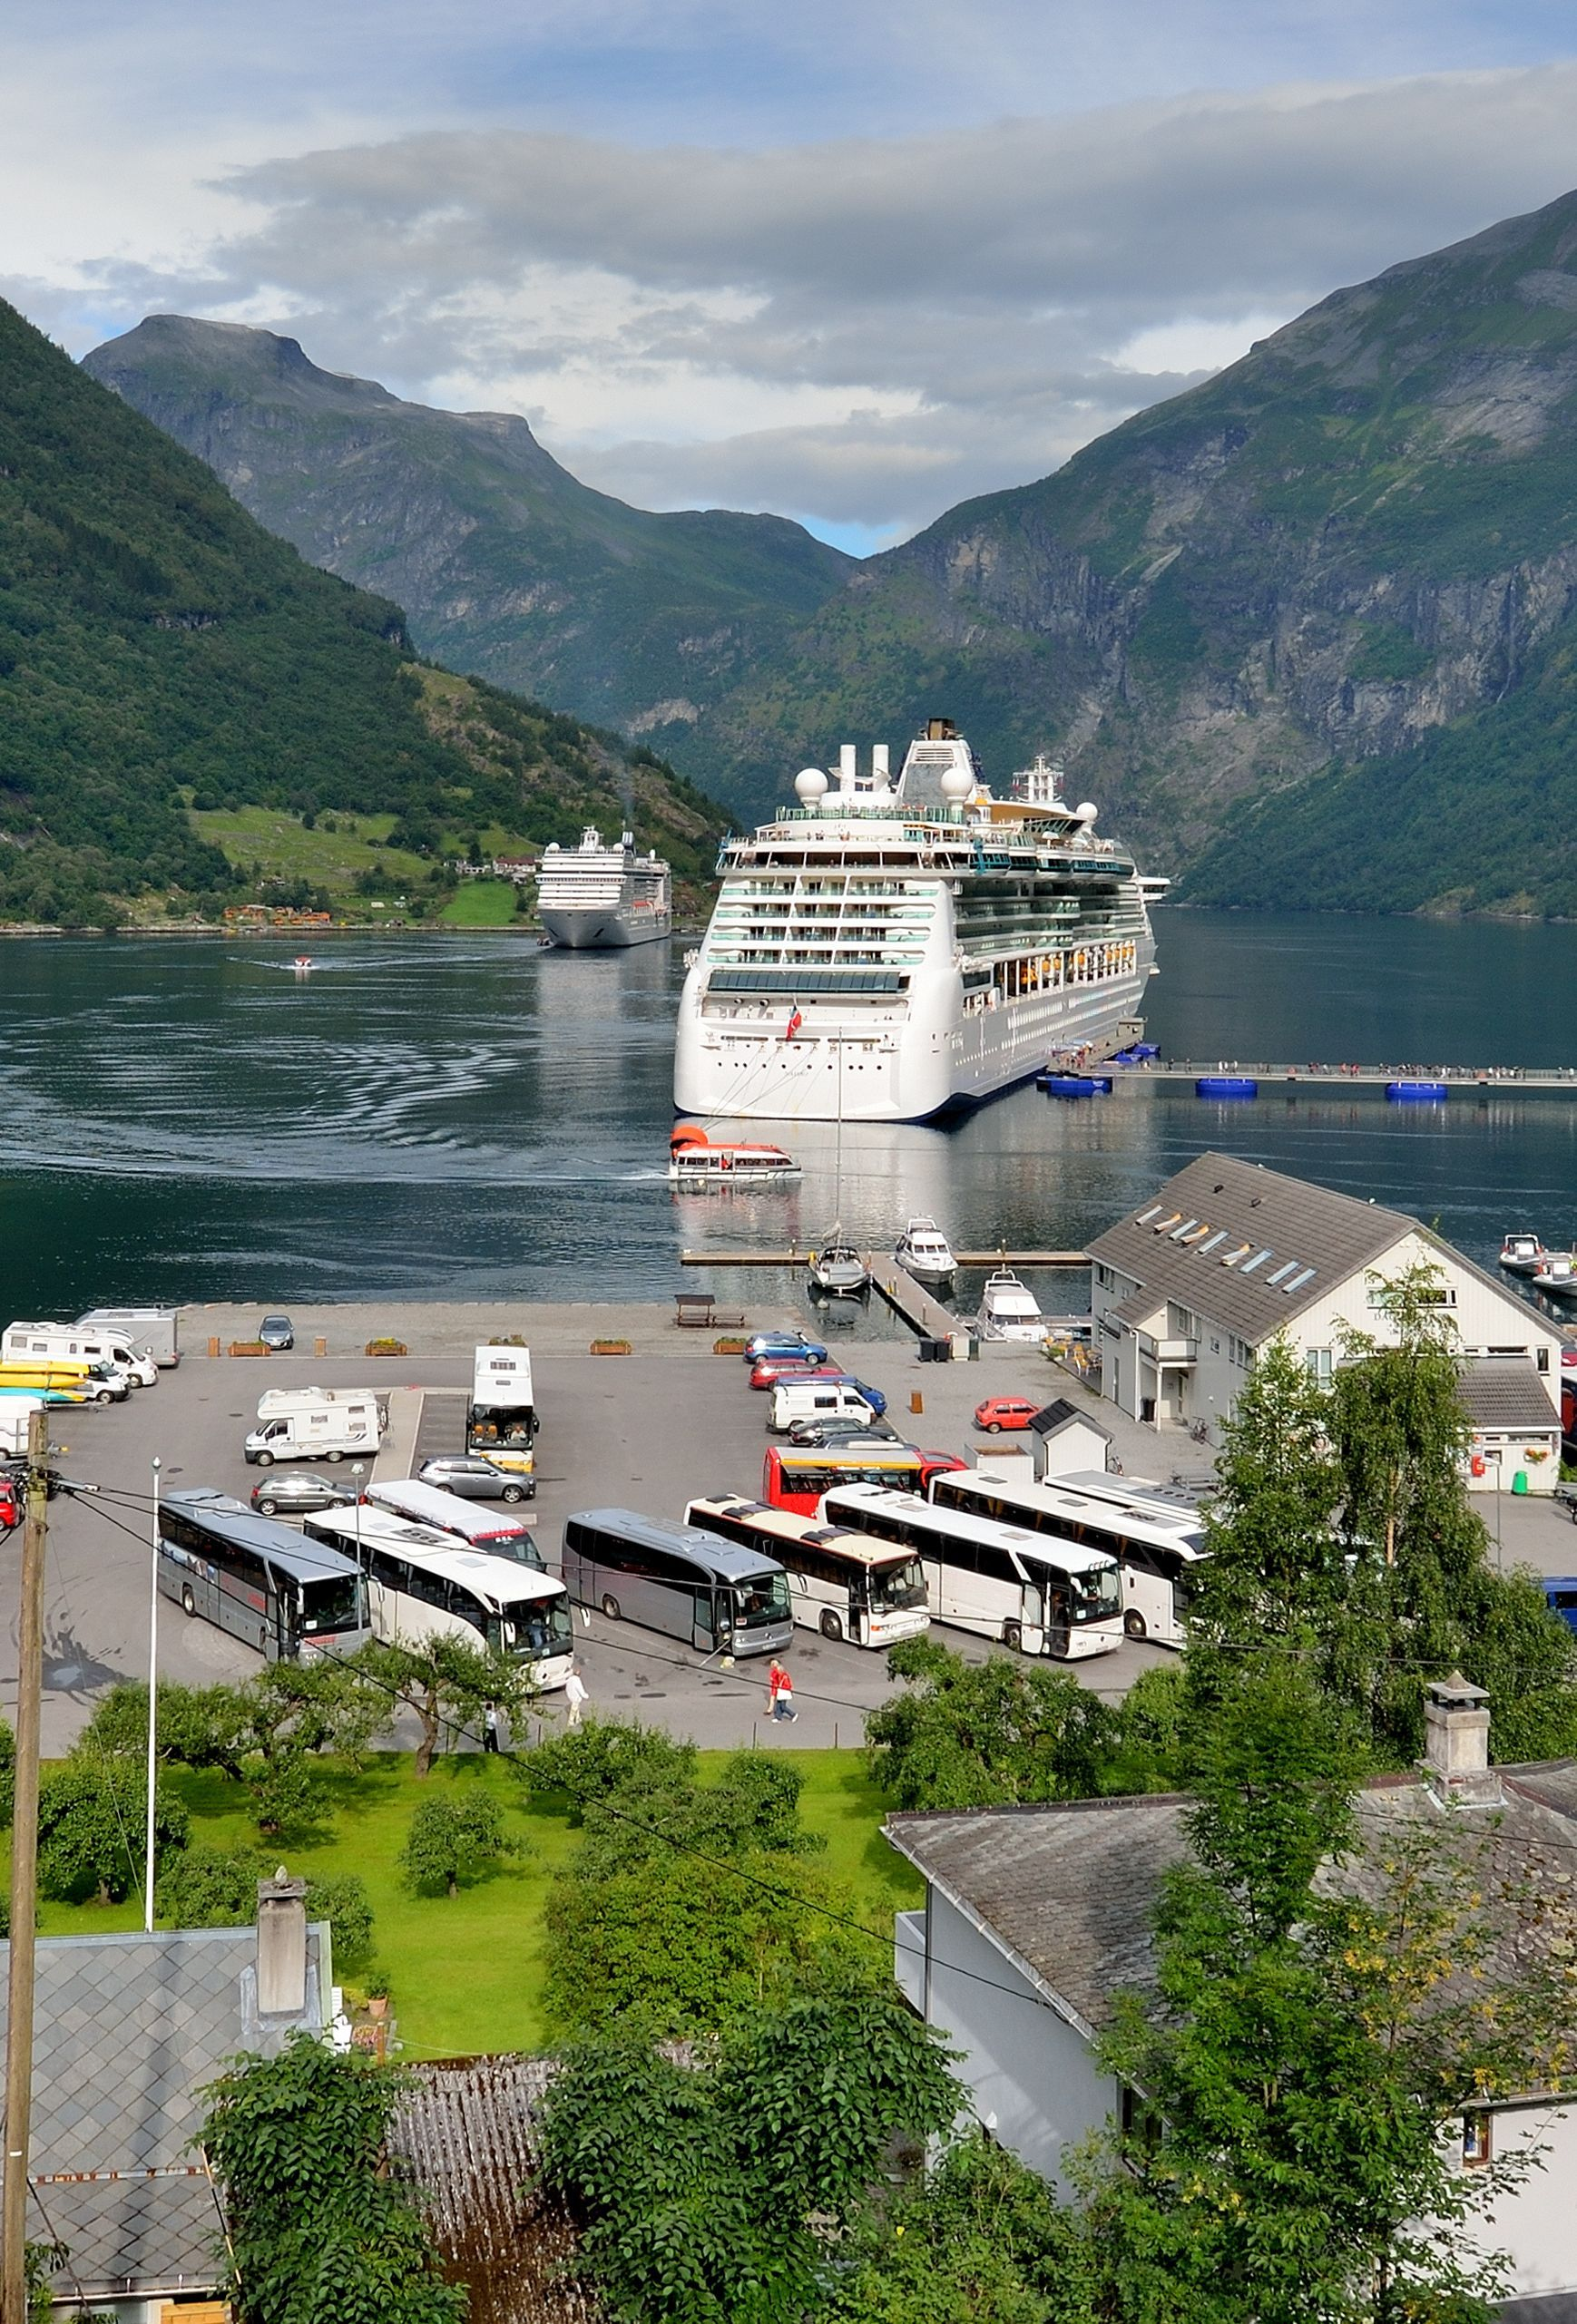 Cruising In Norway 10 Top Notch Norwegian Destinations Norway Cruise Norway Travel Norway Fjords